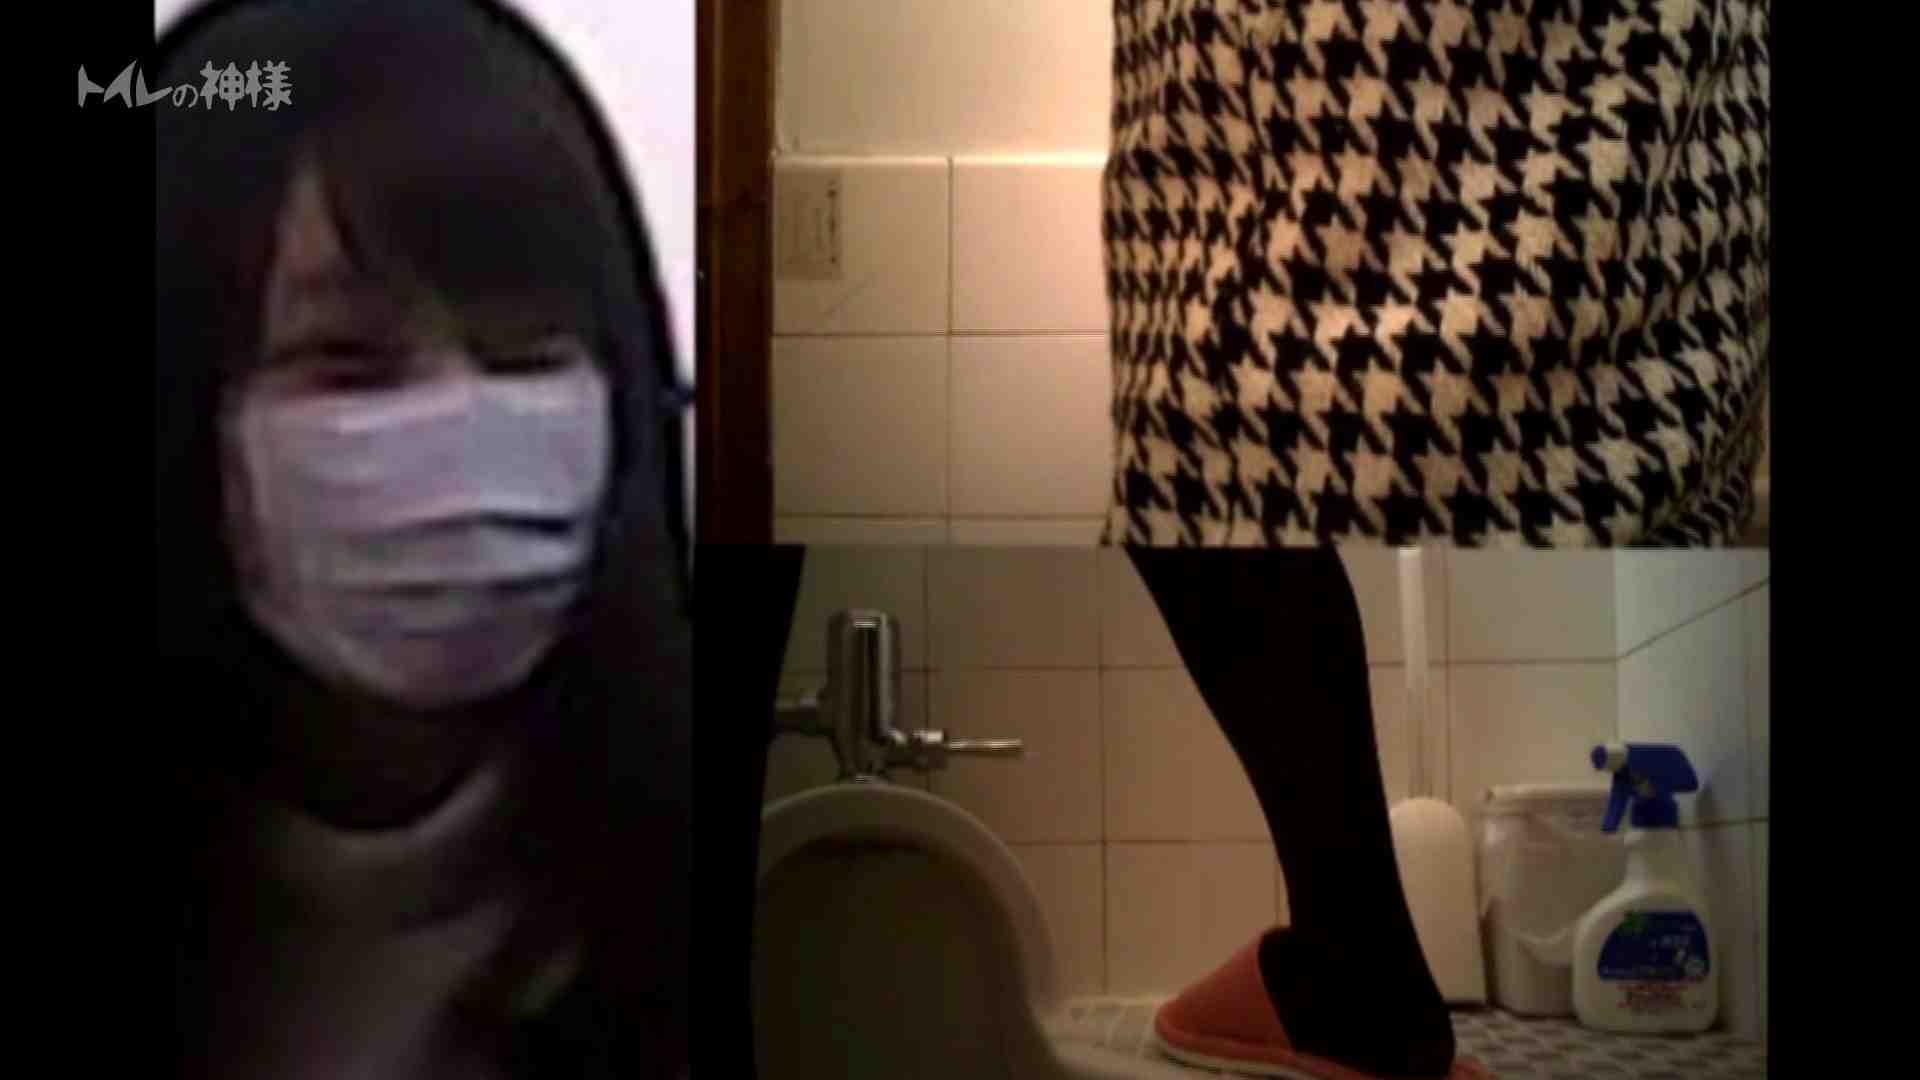 Vol.02 花の女子大生うんこ盗撮2 トイレ中 | 盗撮エロすぎ  34連発 2